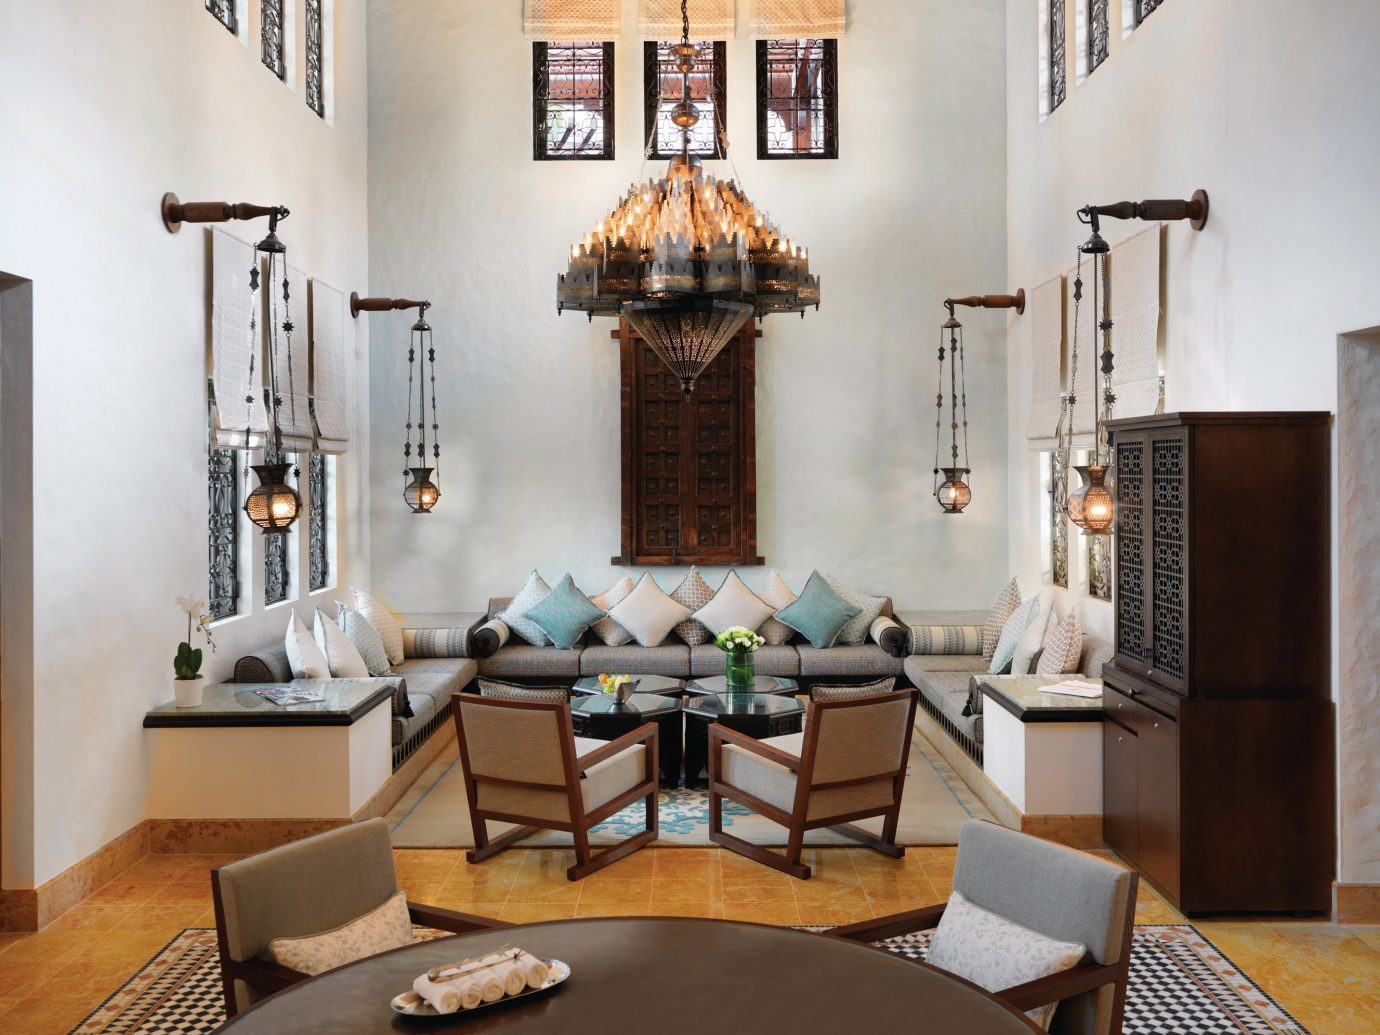 Dubai Hotels Luxury Travel Middle East wall indoor table floor room living room interior design Living furniture dining room home ceiling interior designer